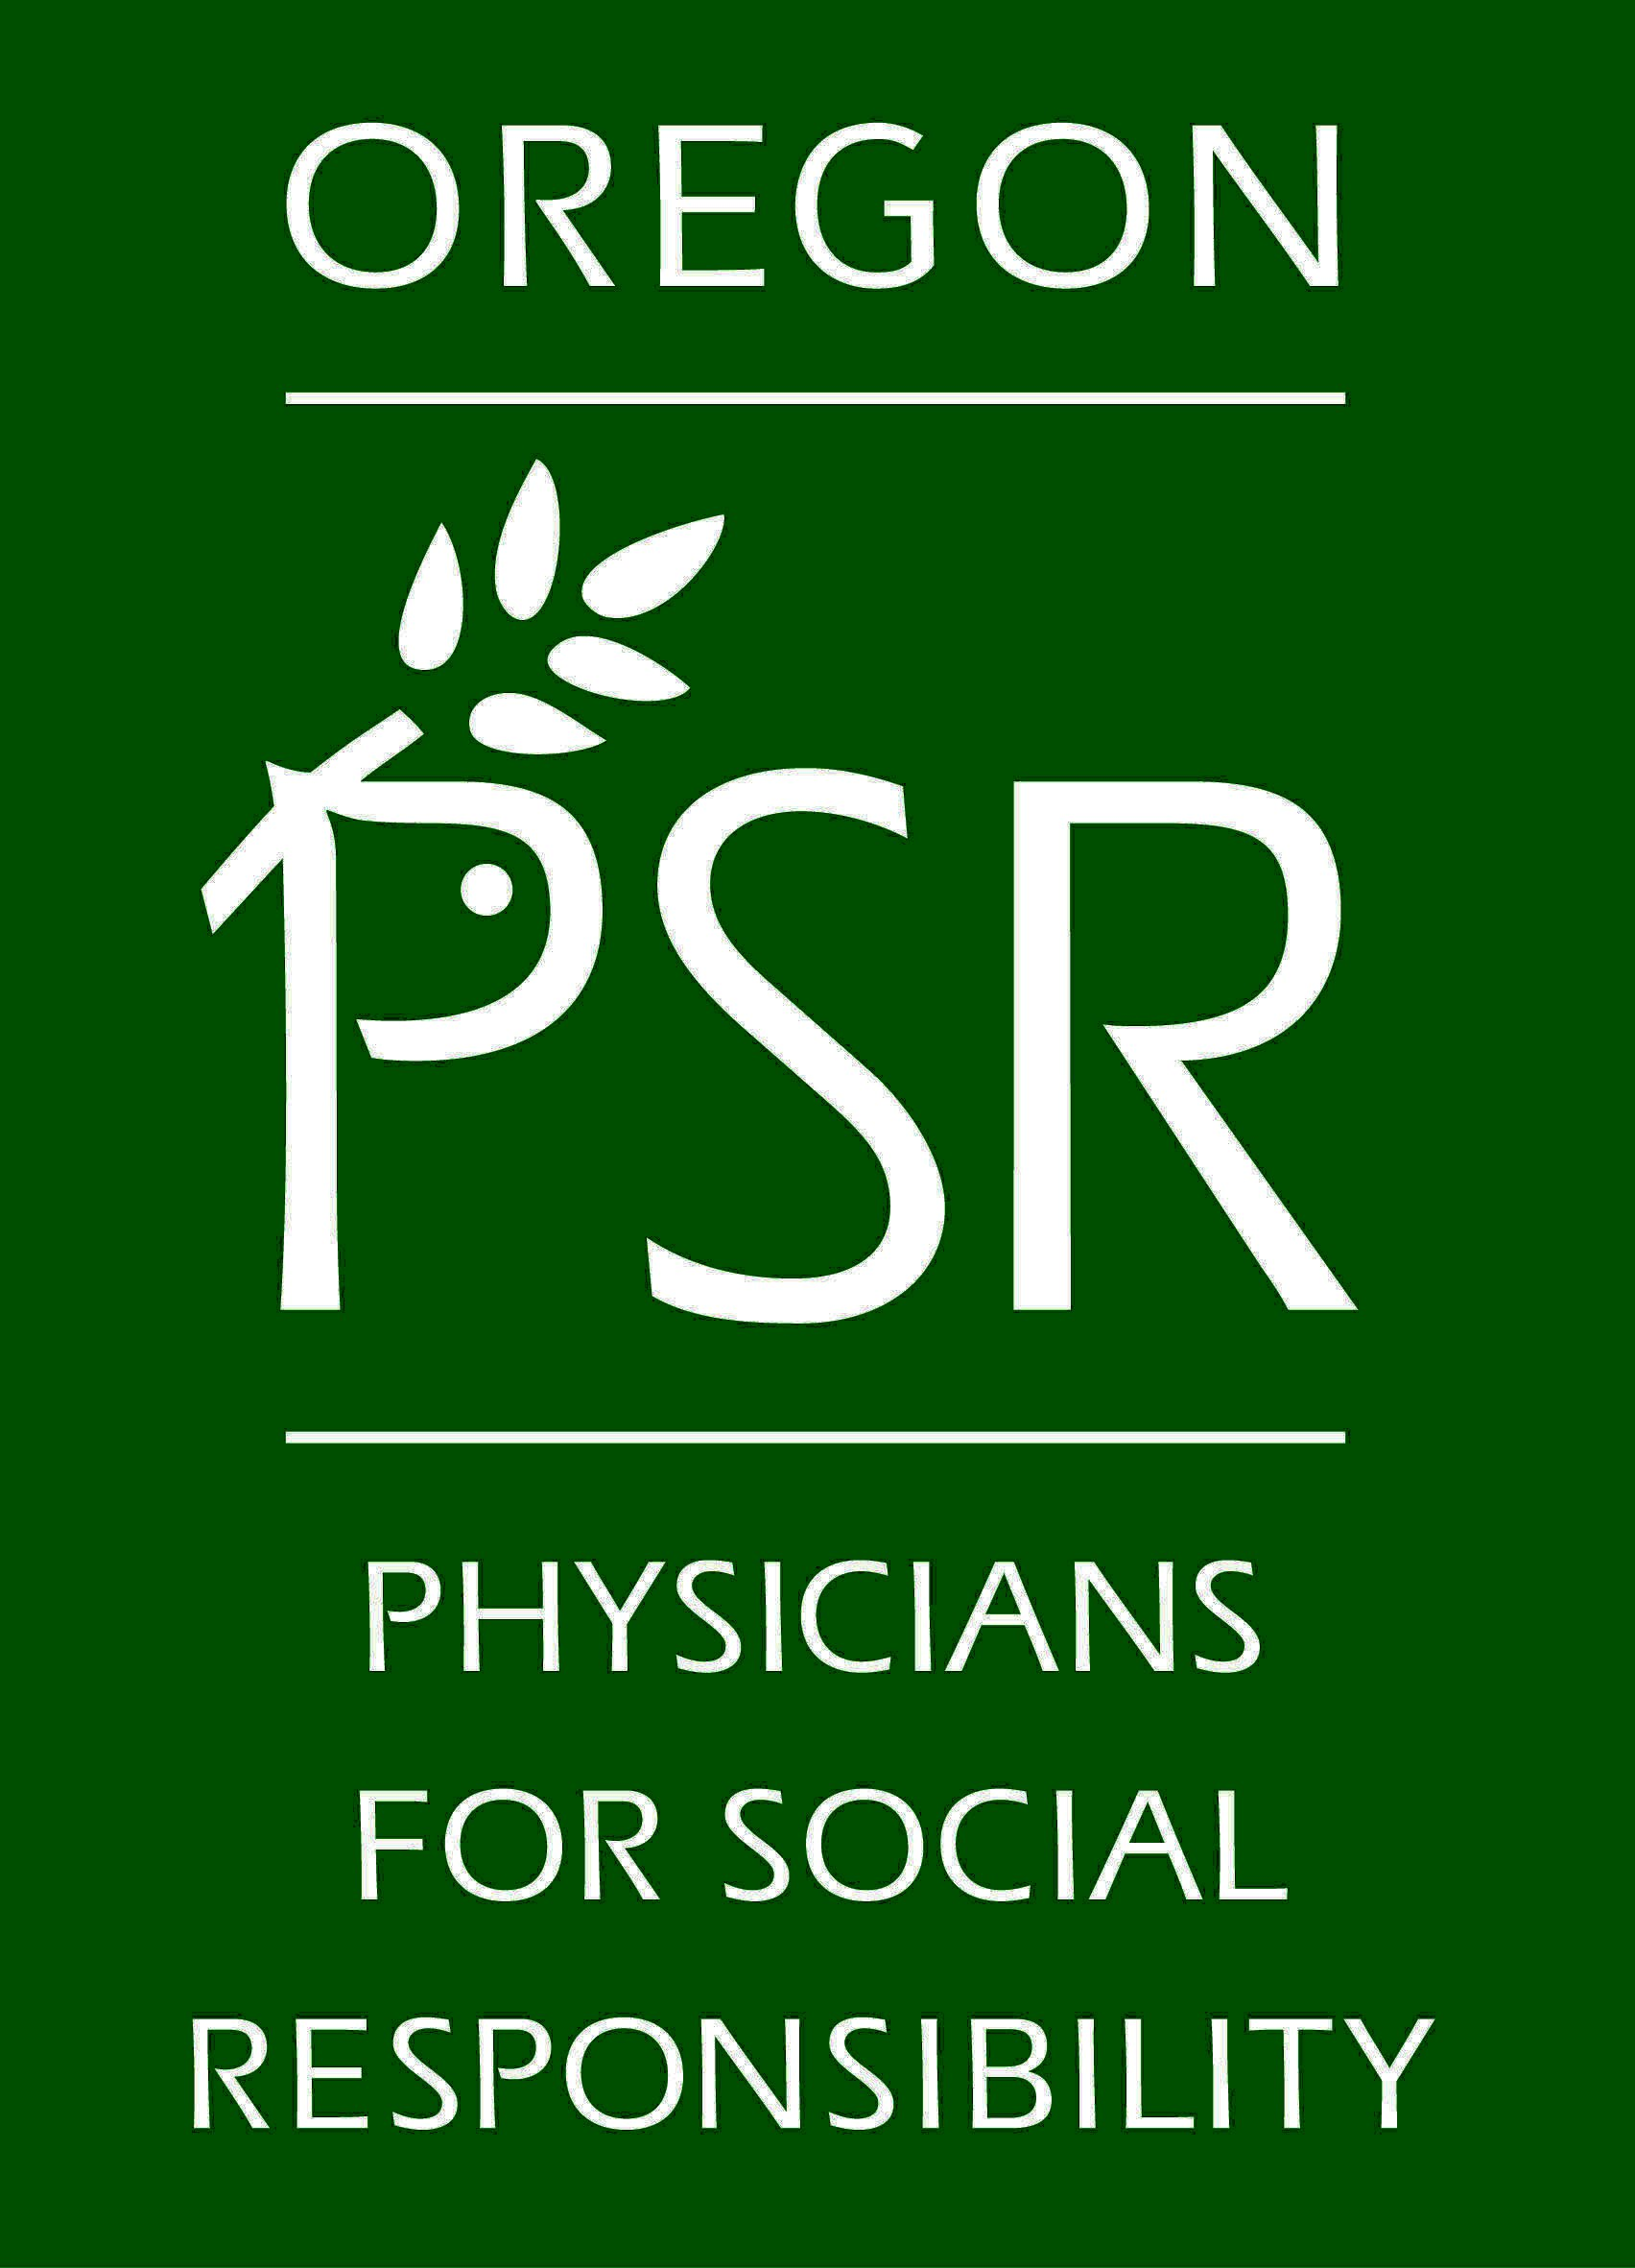 Oregon_PSR_Logo_(dark_green).jpg